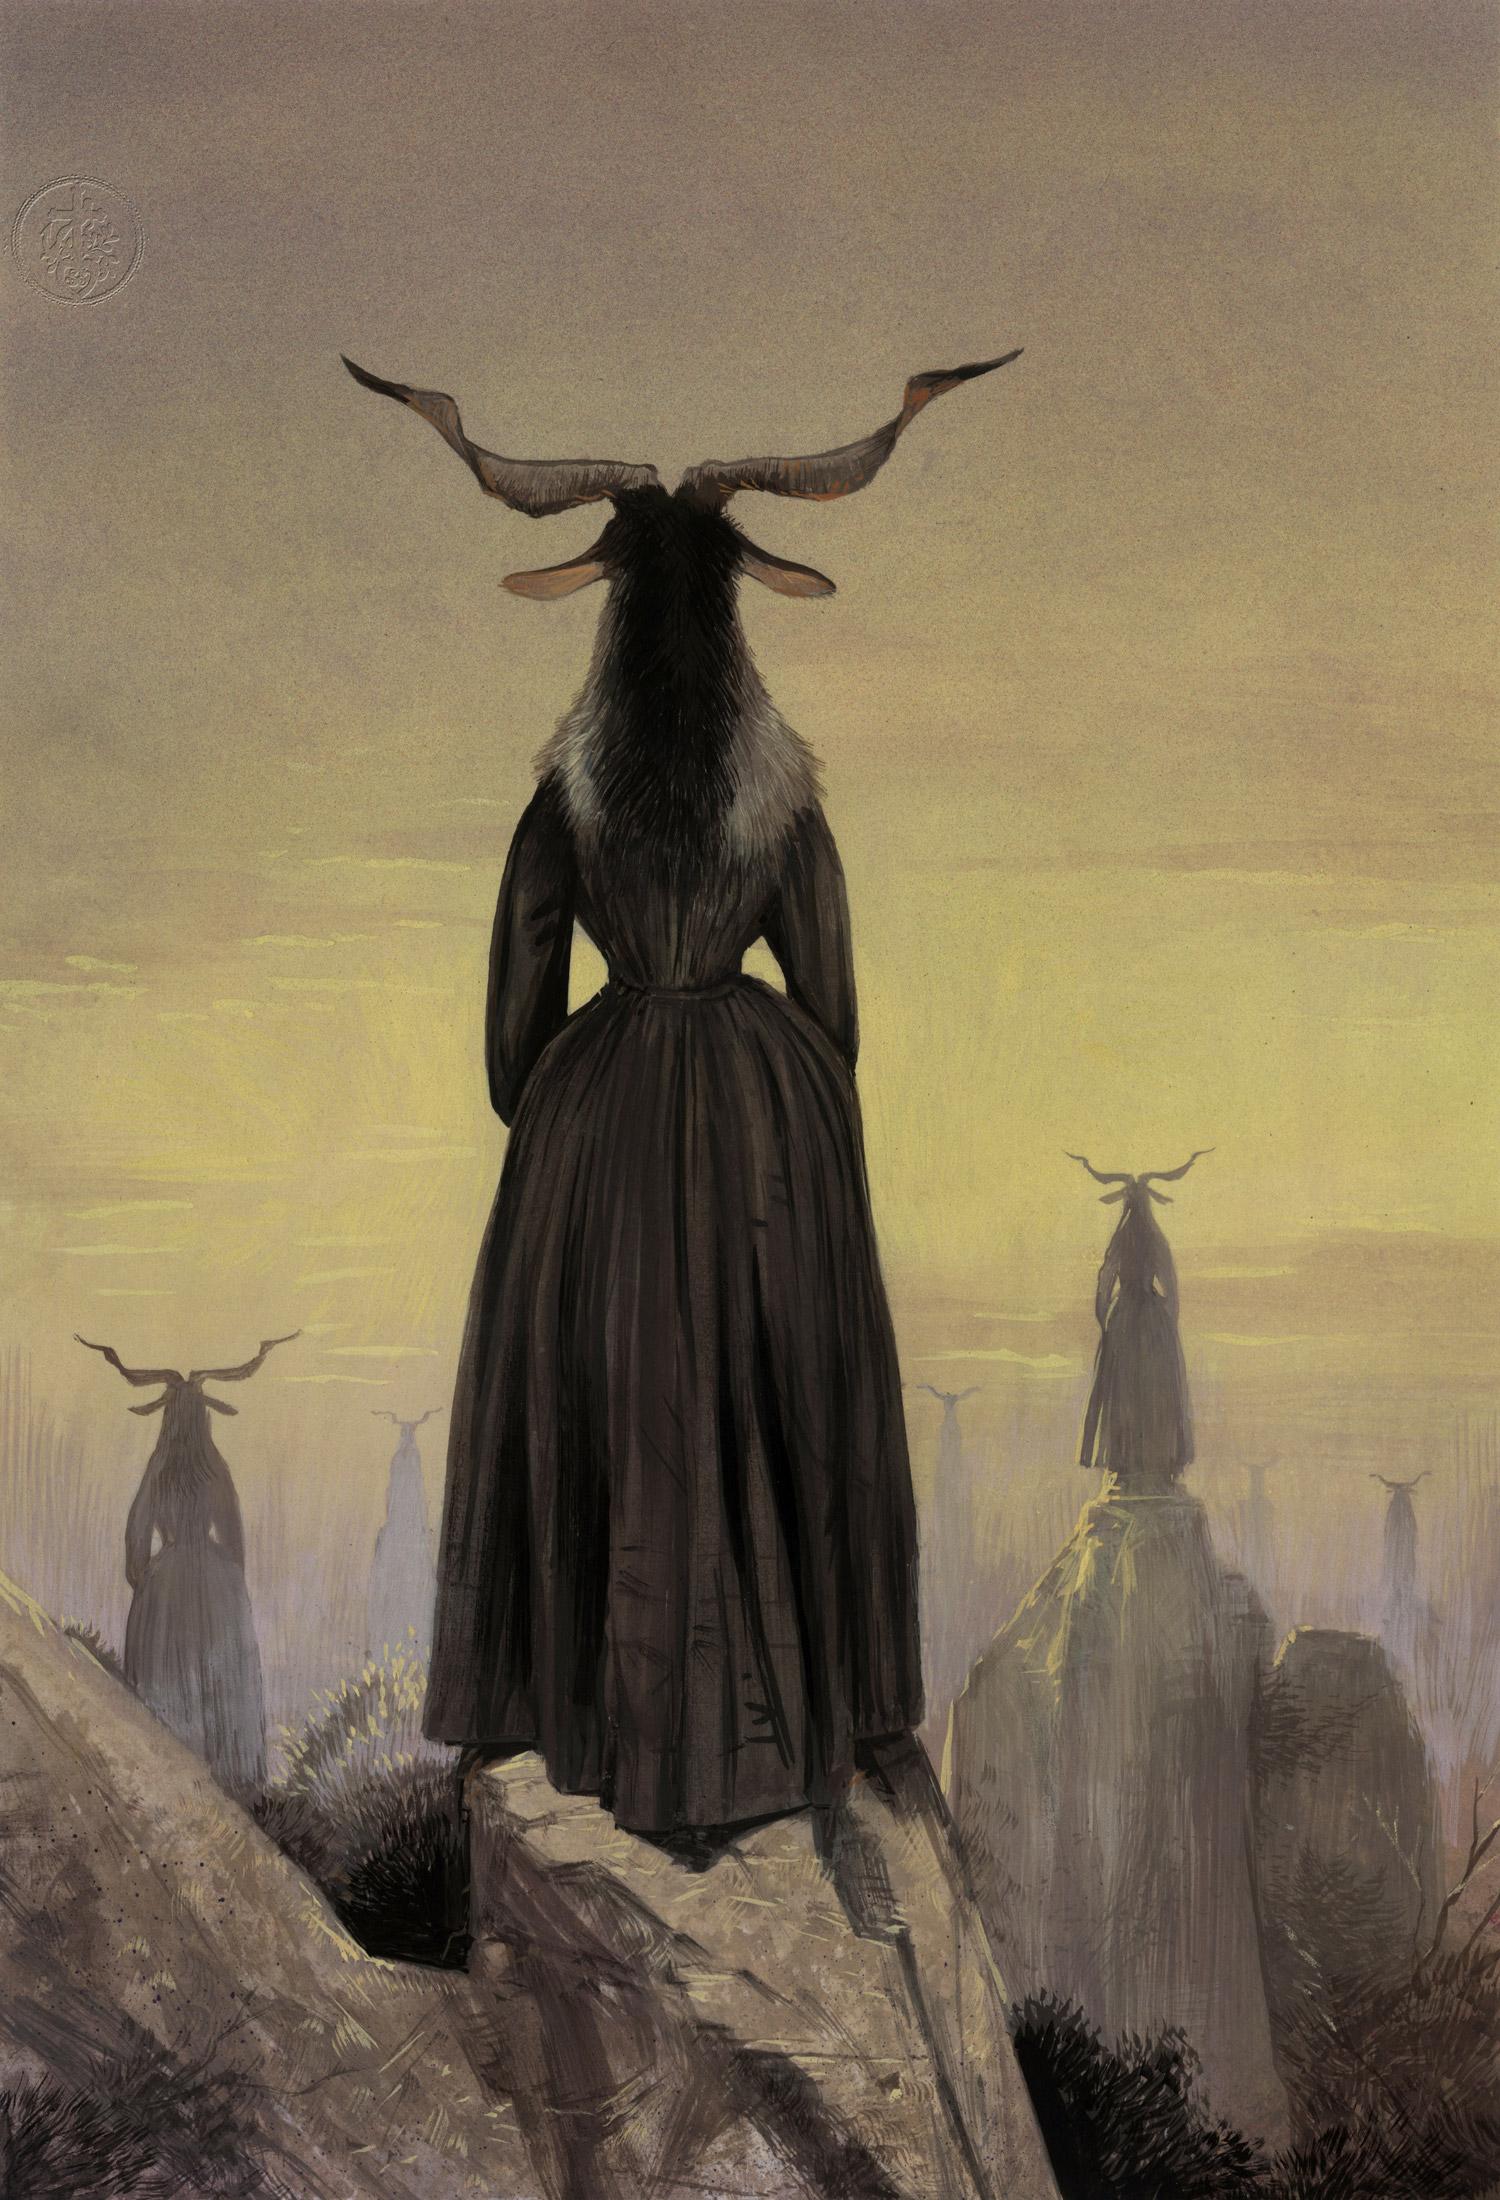 Bill Mayer - La Samhain